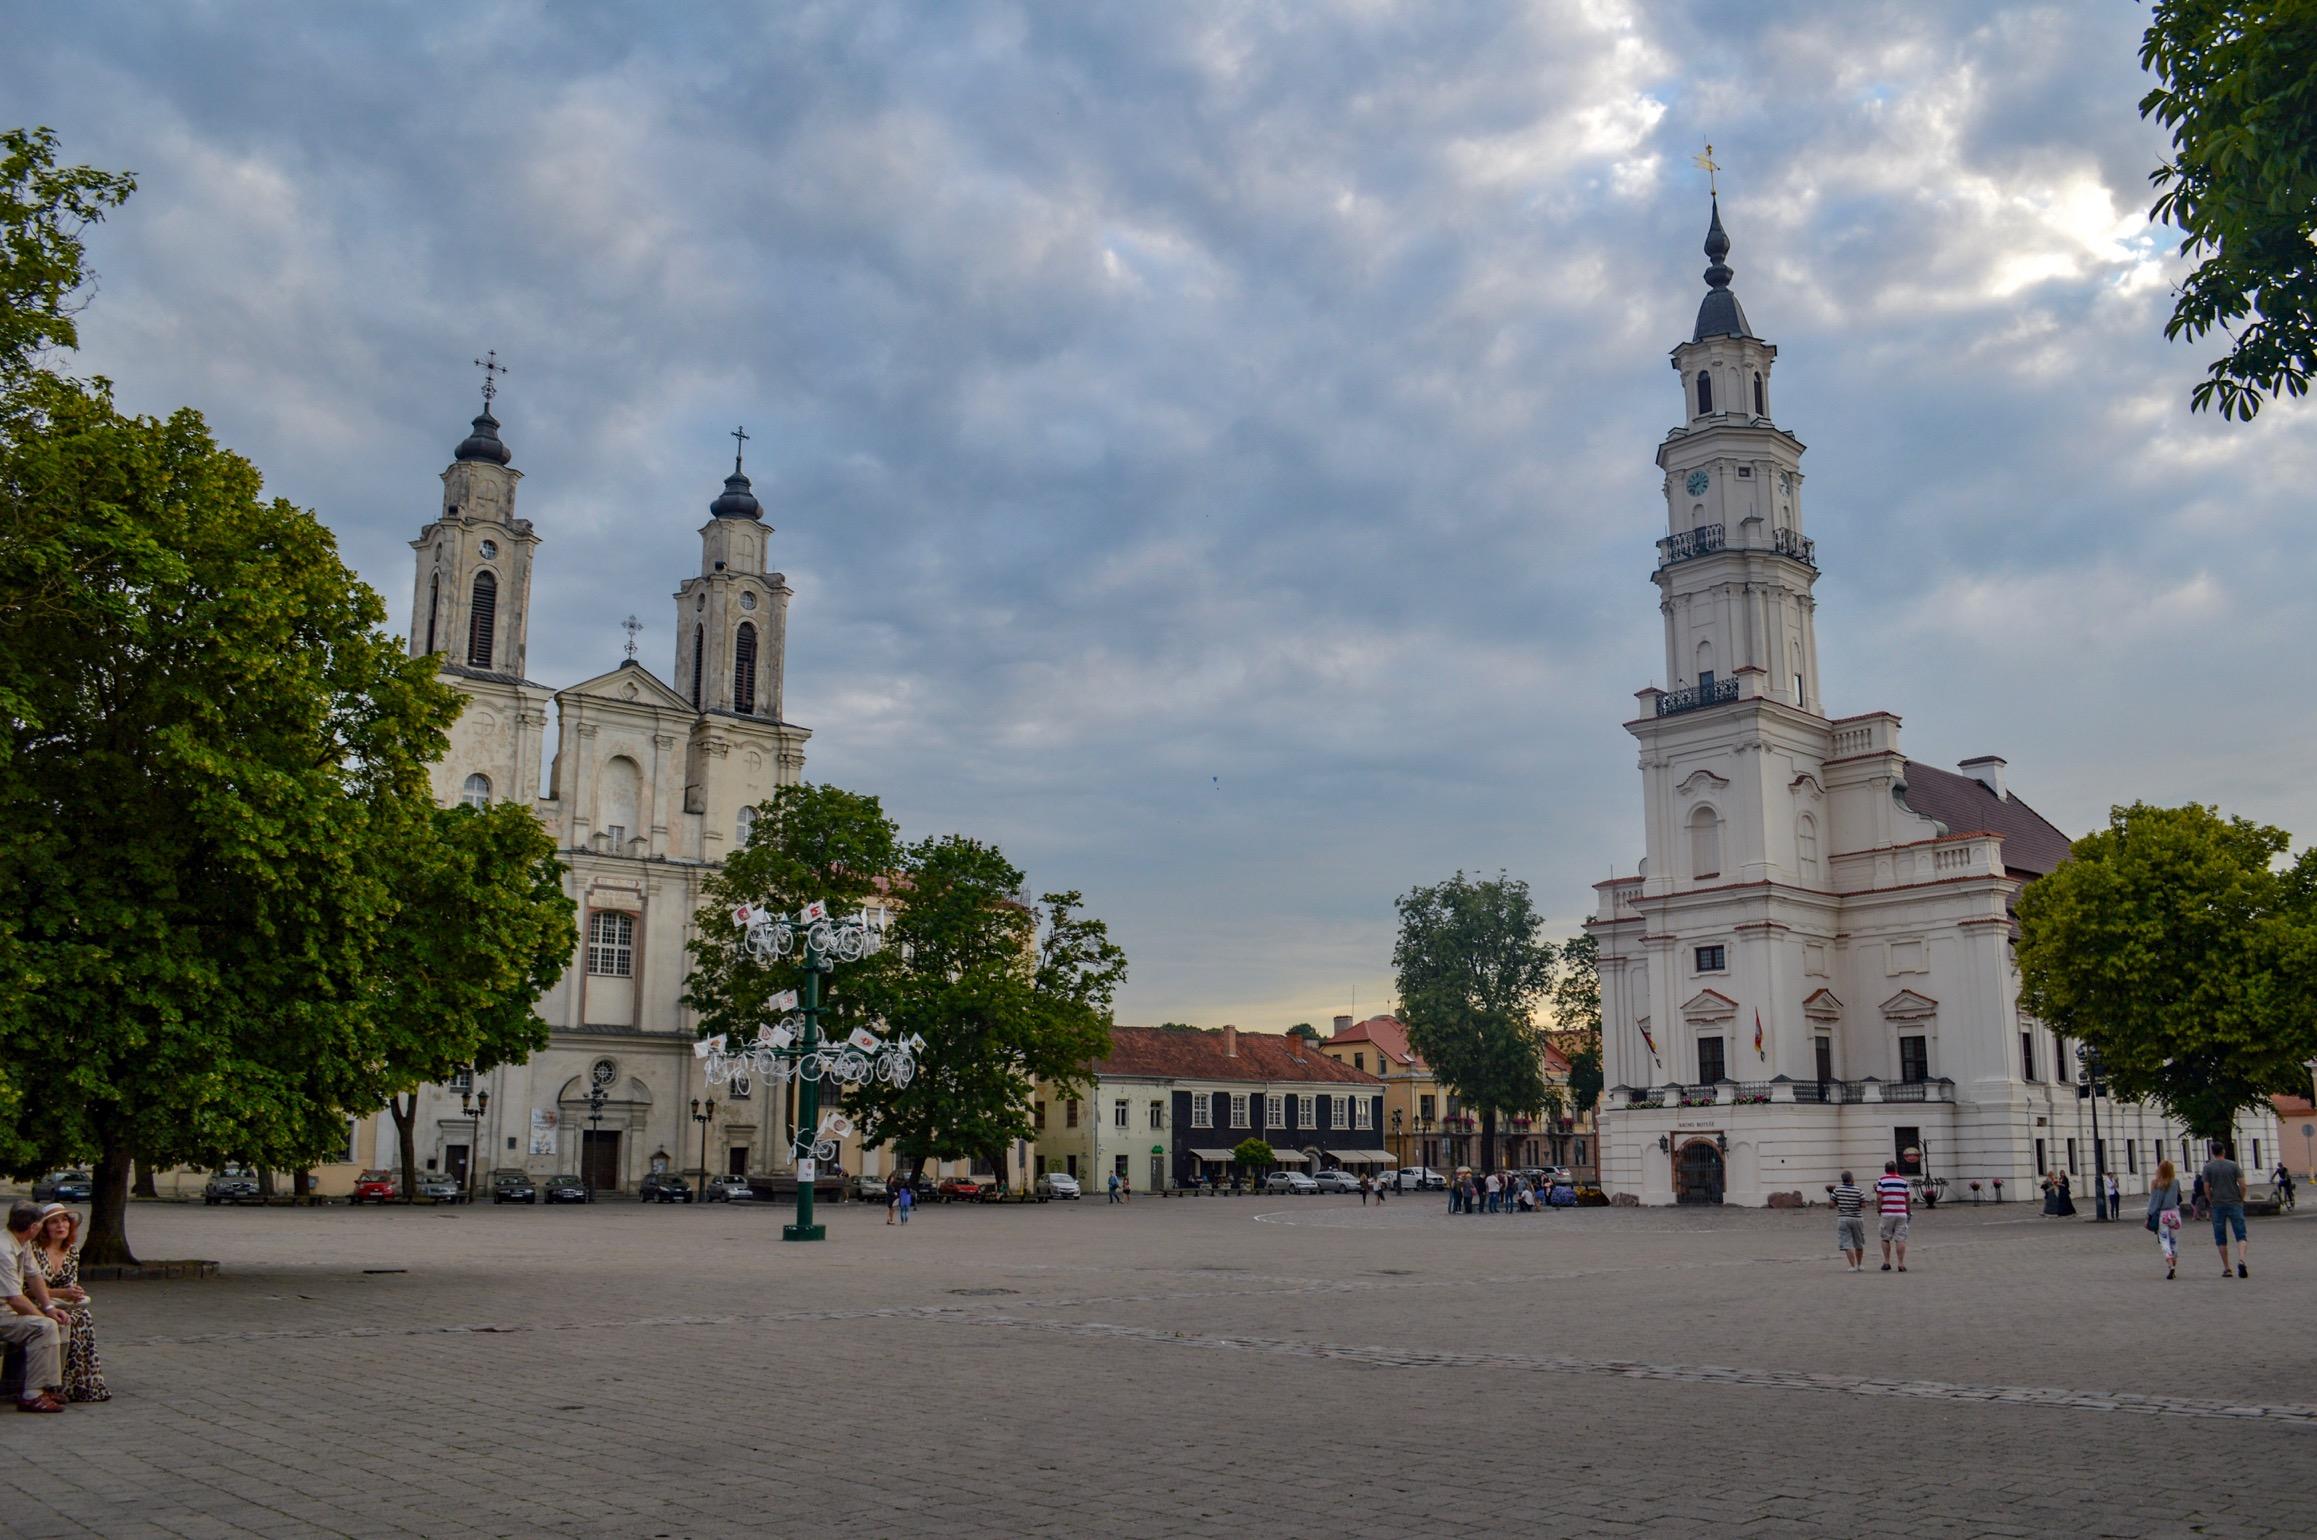 City Hall Square, Kaunas, Lithuania